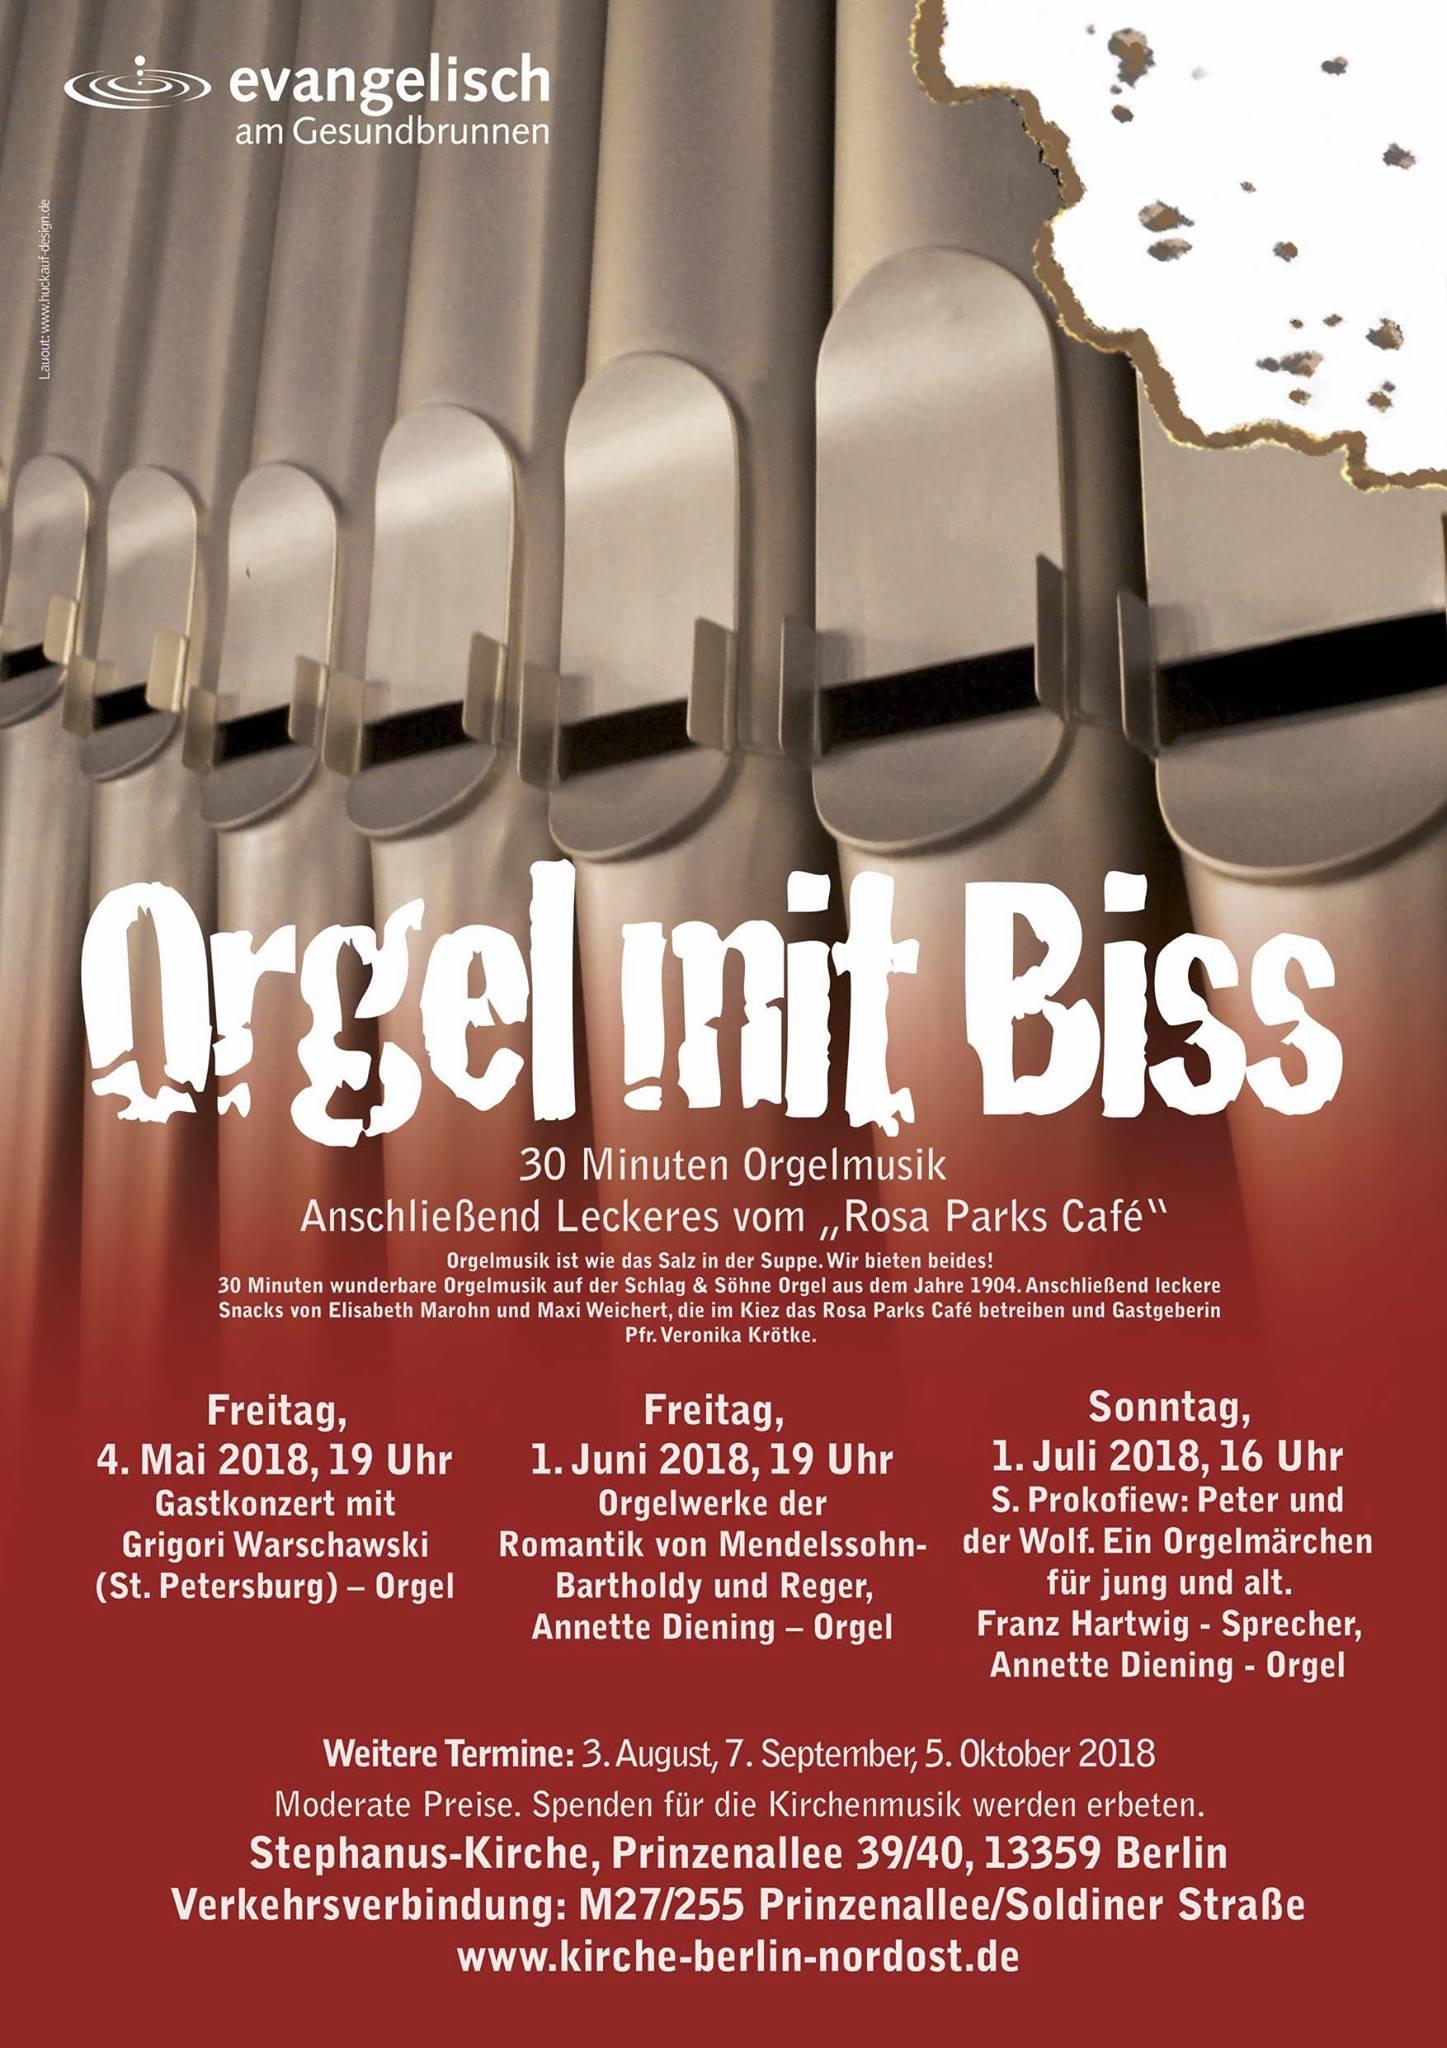 Orgel mit Biss stephanus Kirche termine.jpg